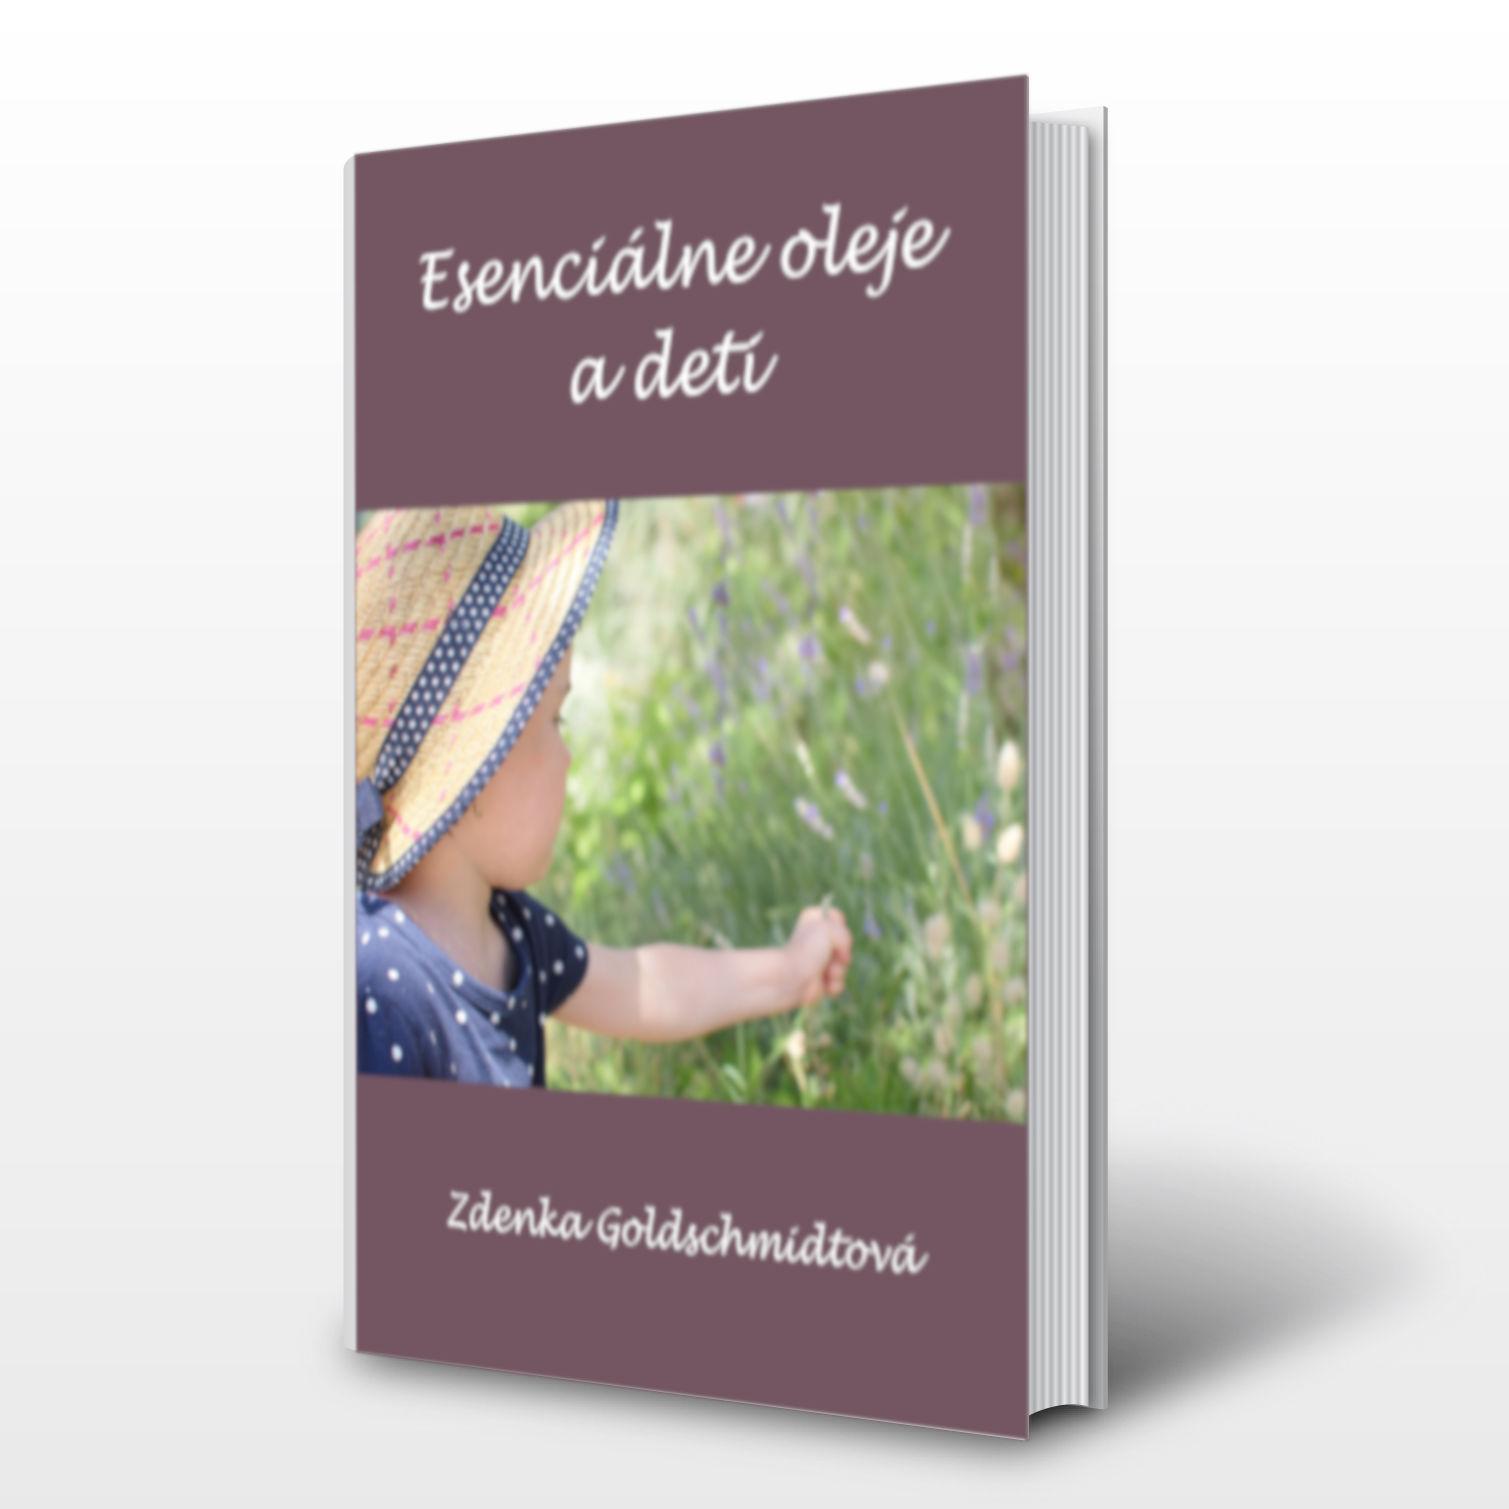 Esenciálne oleje adeti ebook